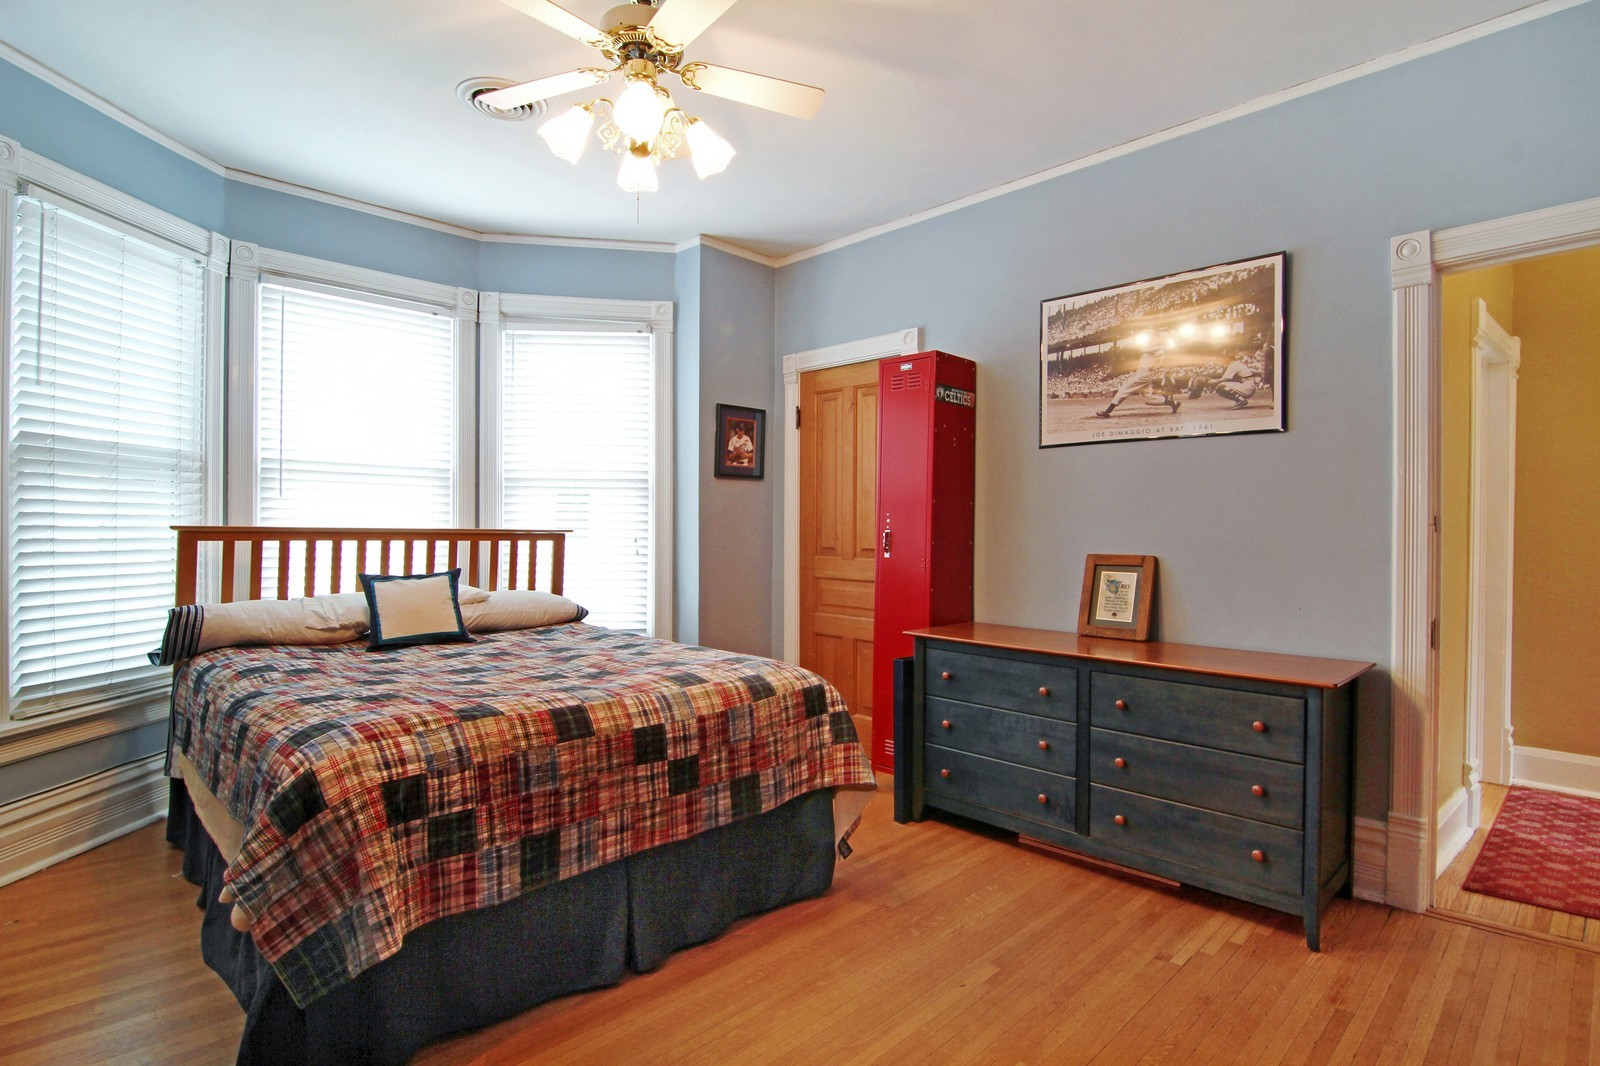 Real Estate Photography - 228 LaGrange Rd, La Grange, IL, 60525 - 2nd Bedroom